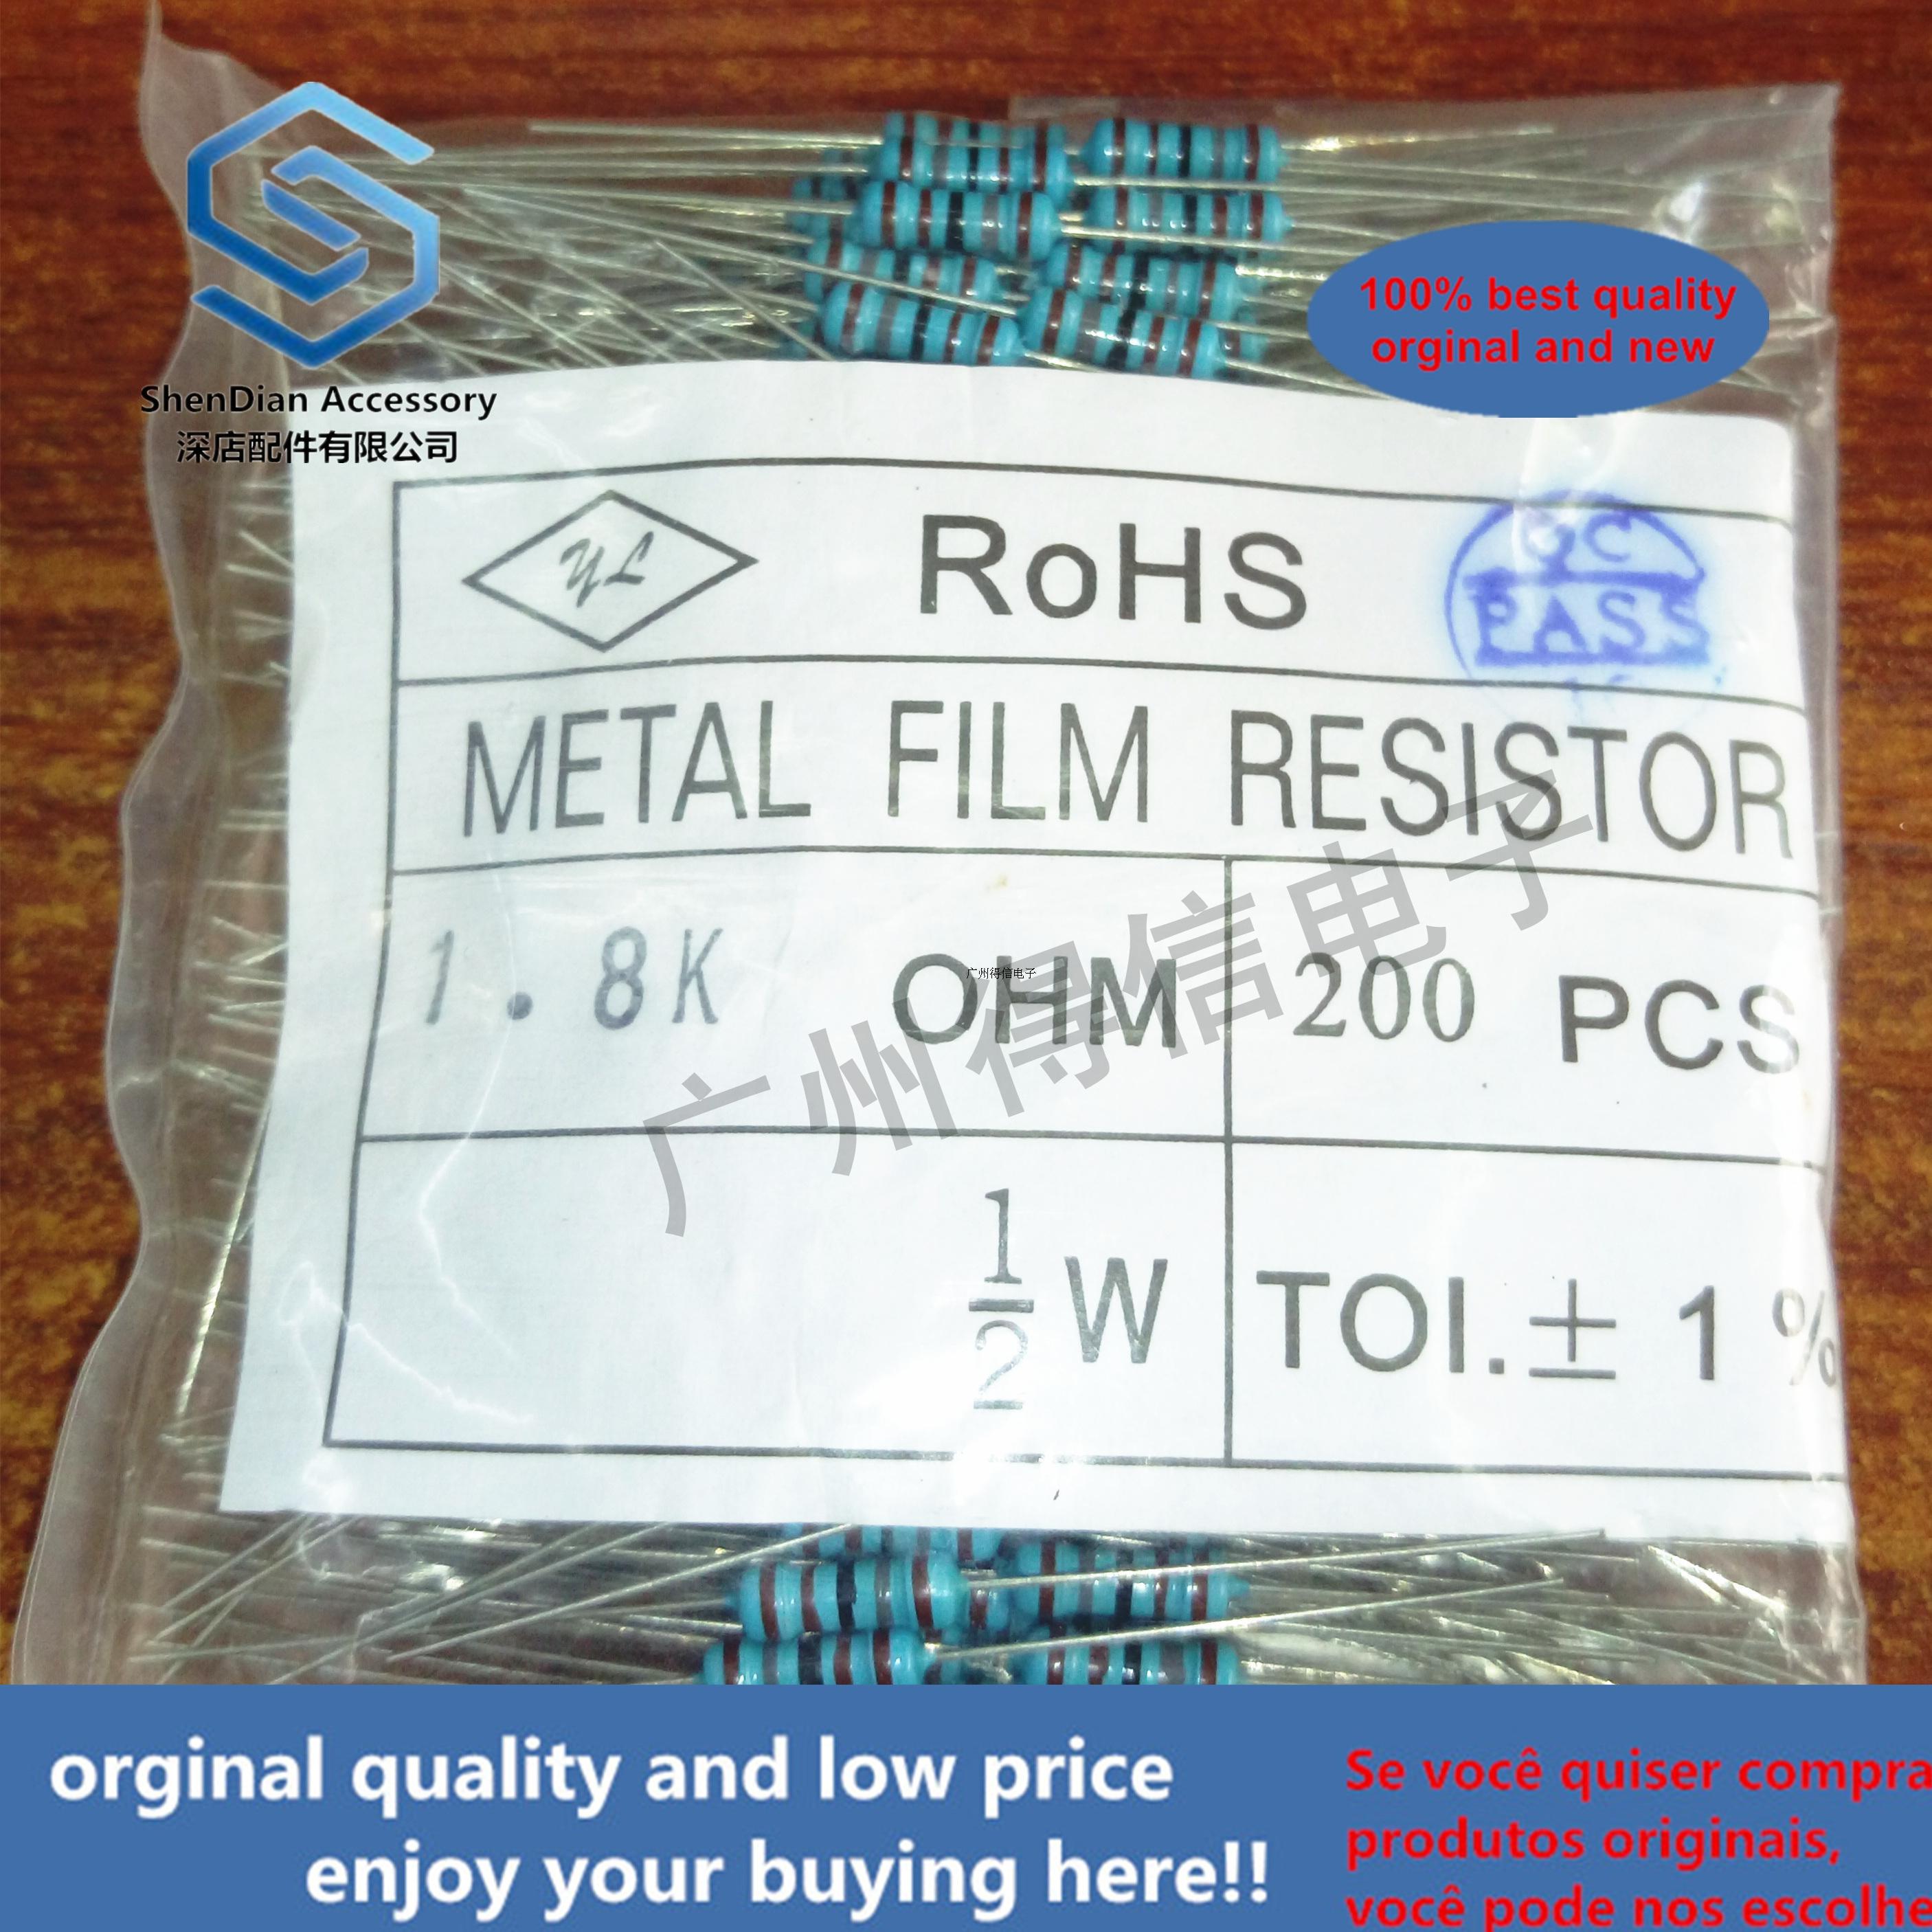 200pcs 1 / 2W 470K 1% Brand New Metal Film Iron Feet Resistance Bag 200 Pcs Per Pack